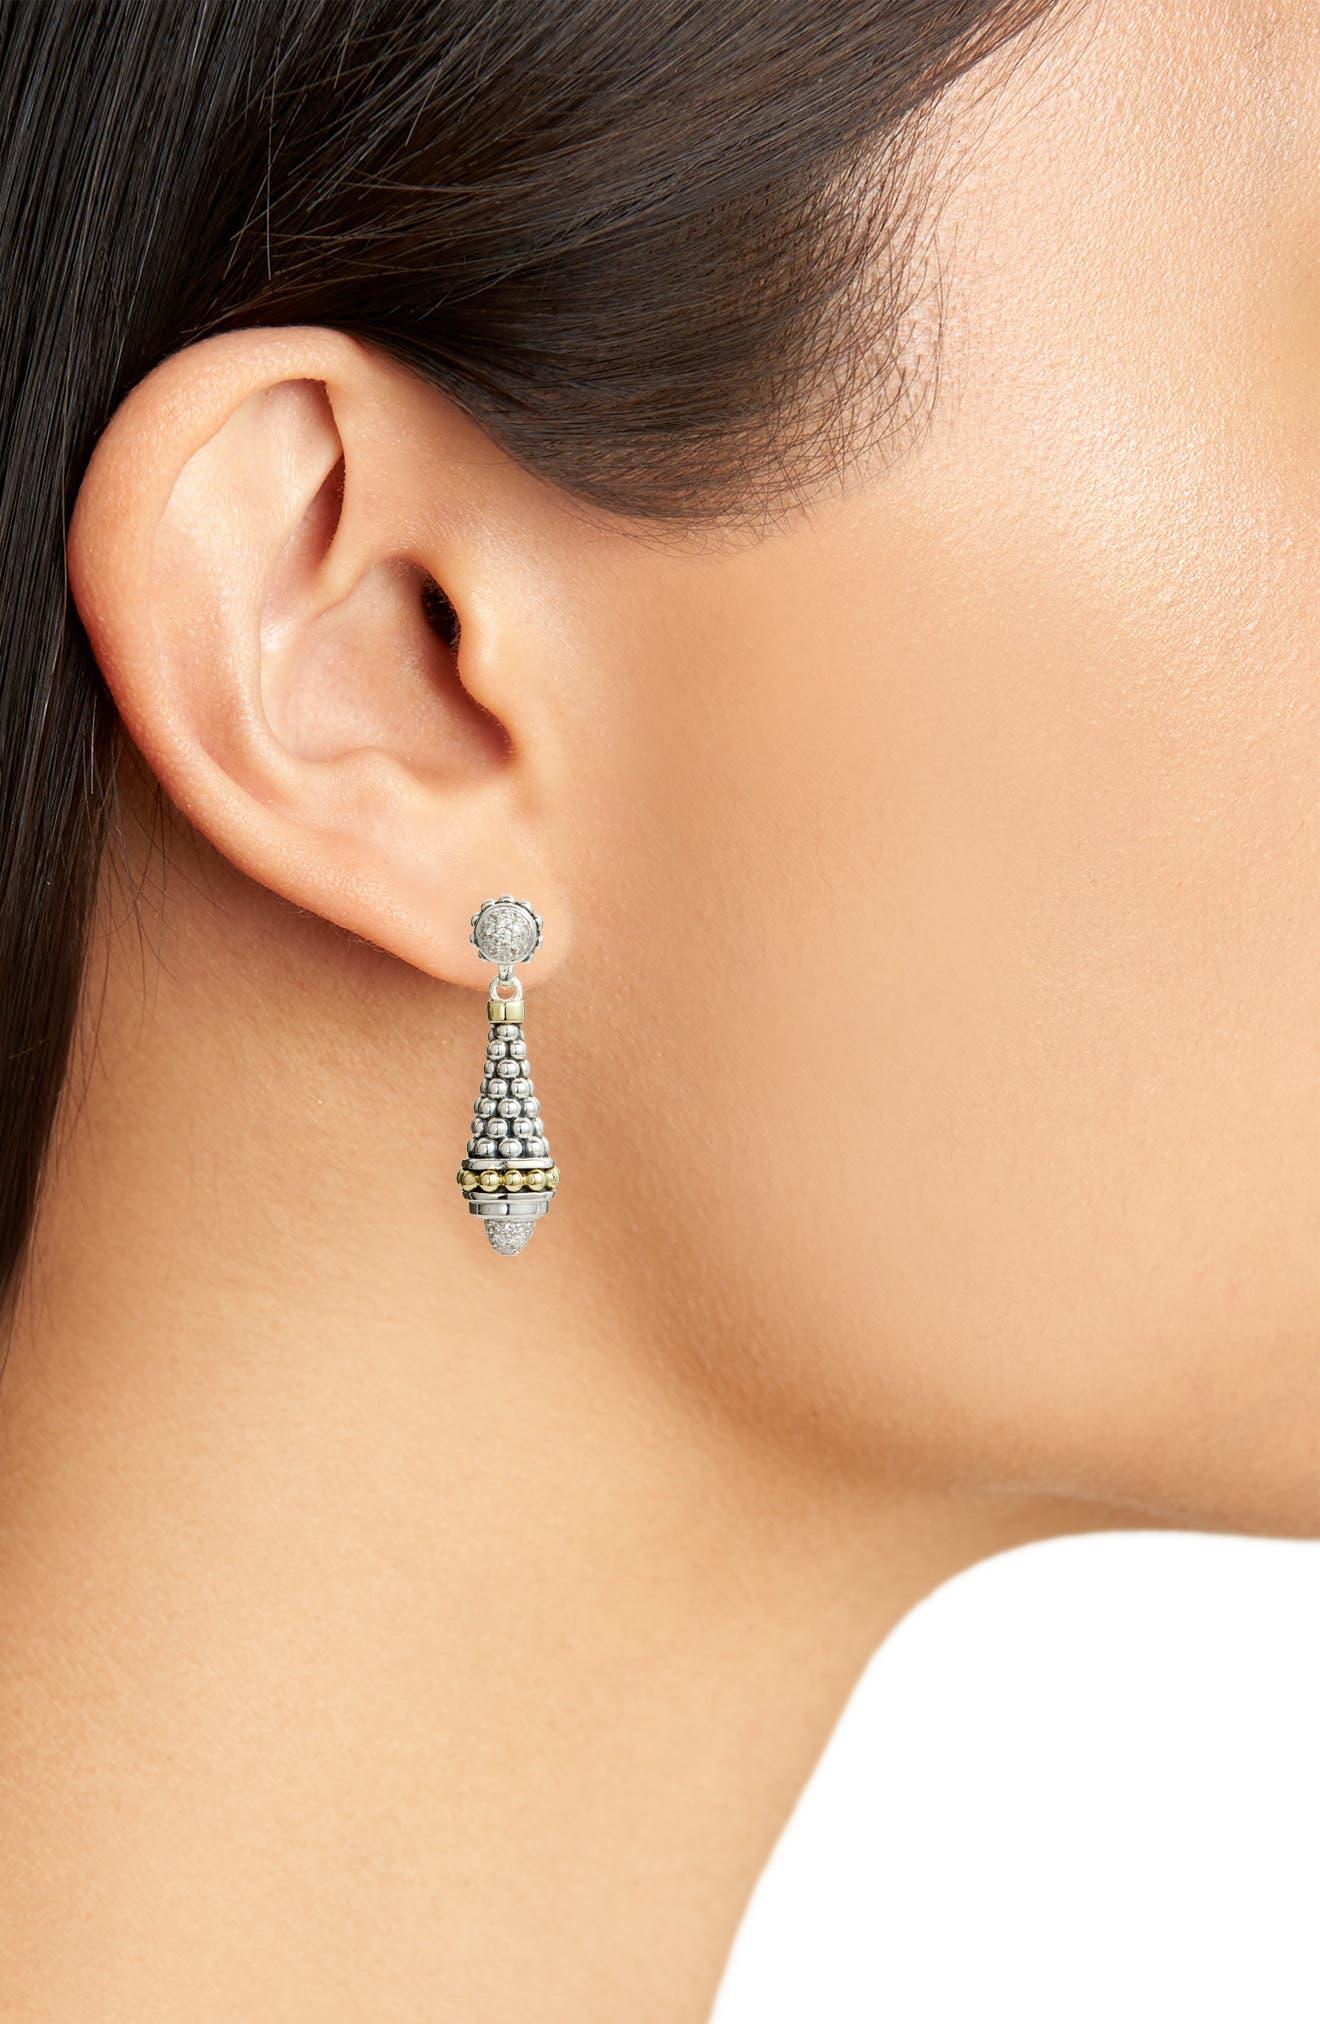 Signature Caviar Diamond Pavé Cap Drop Earrings,                             Alternate thumbnail 3, color,                             SILVER/ DIAMOND